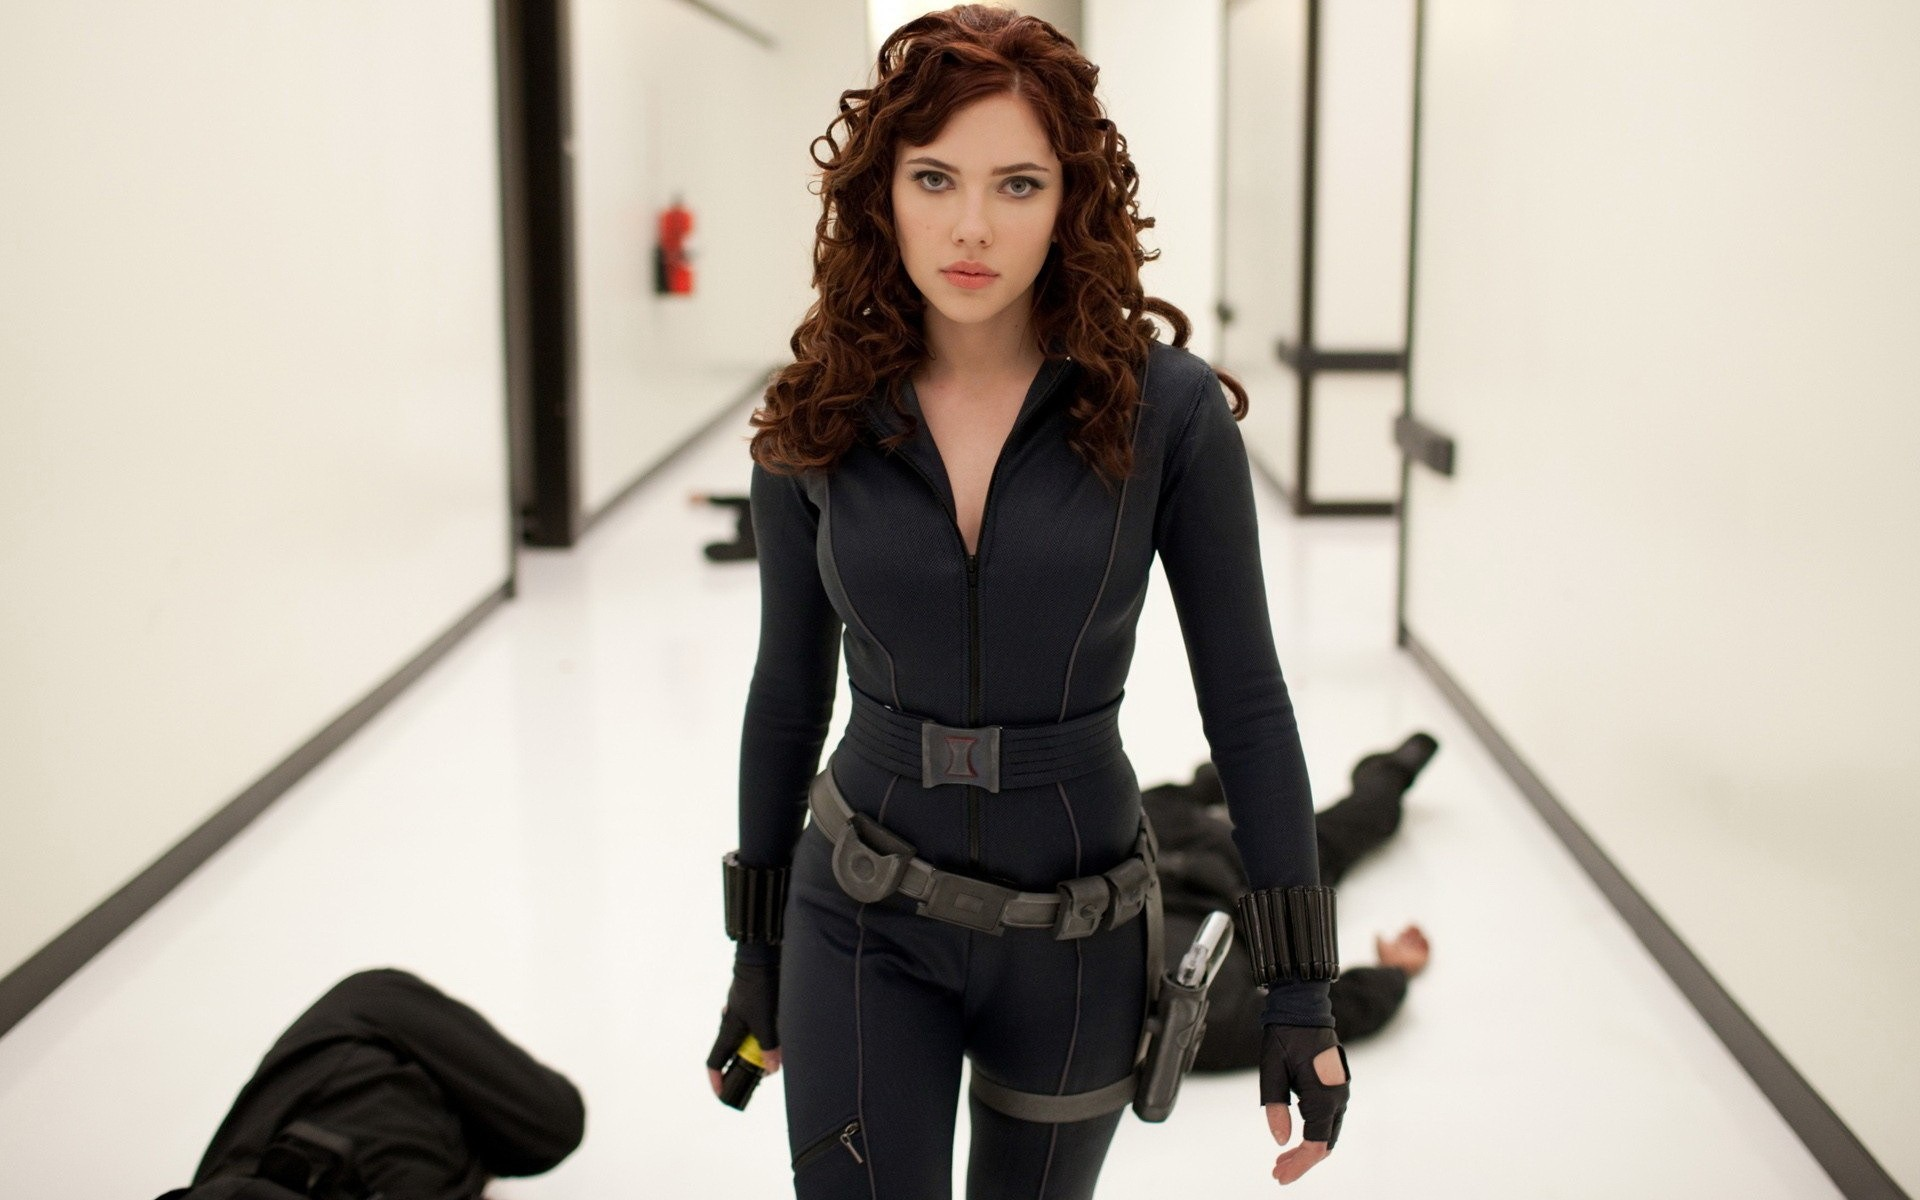 Scarlett Johansson Iron Man - 1920x1200